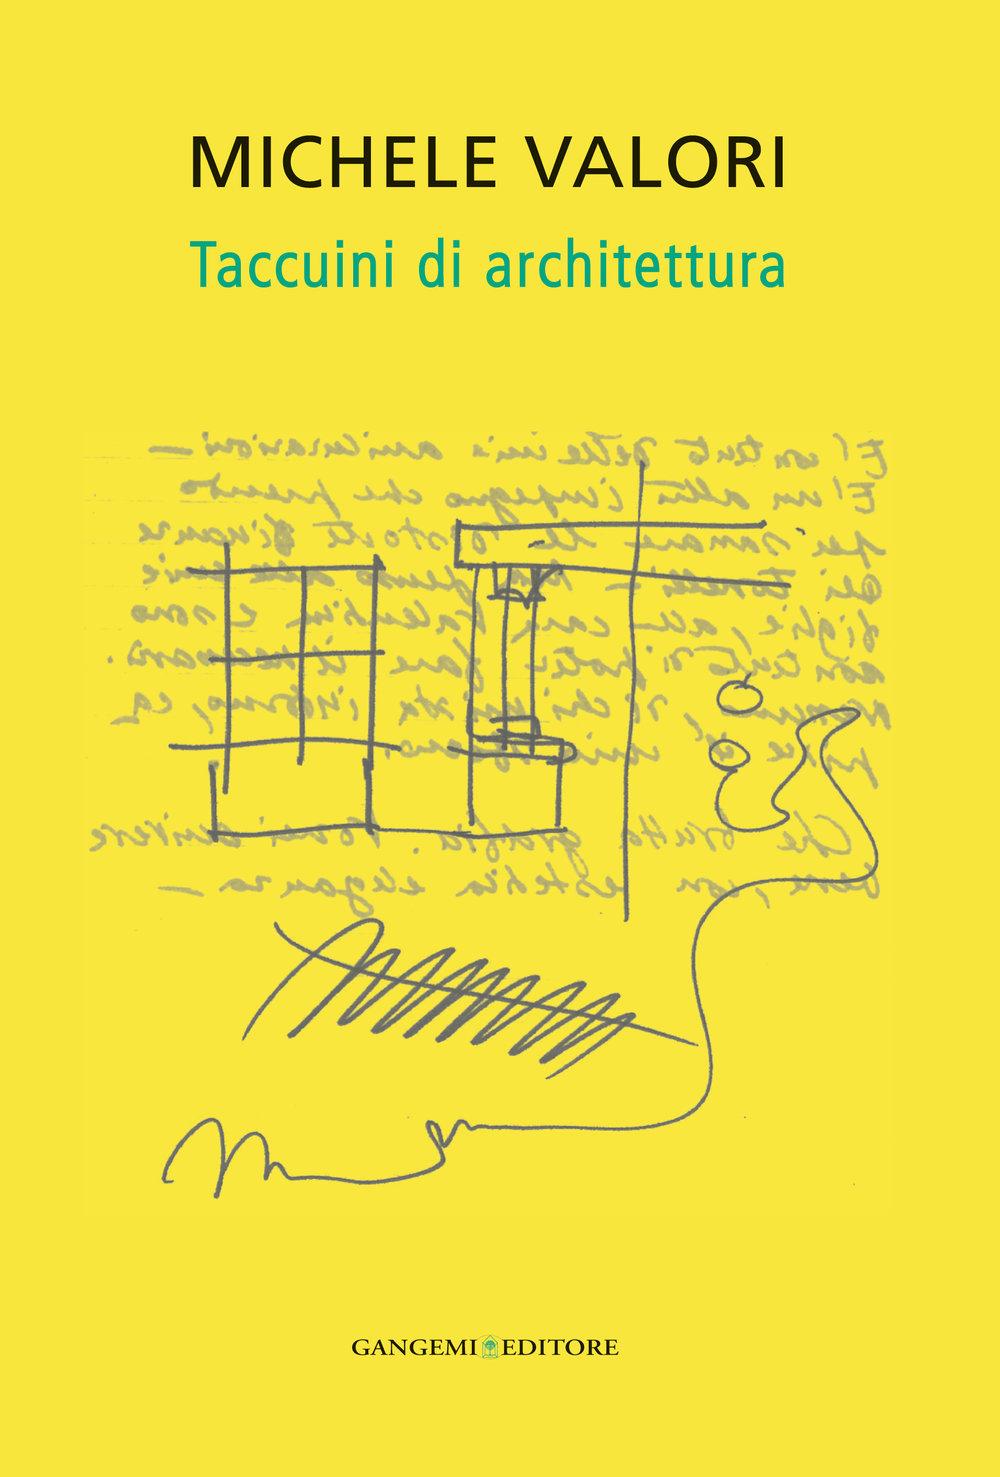 Taccuini di architettura a cura di Maria Valentina Tonelli Valori e Margherita Guccione (Gangemi 2013)